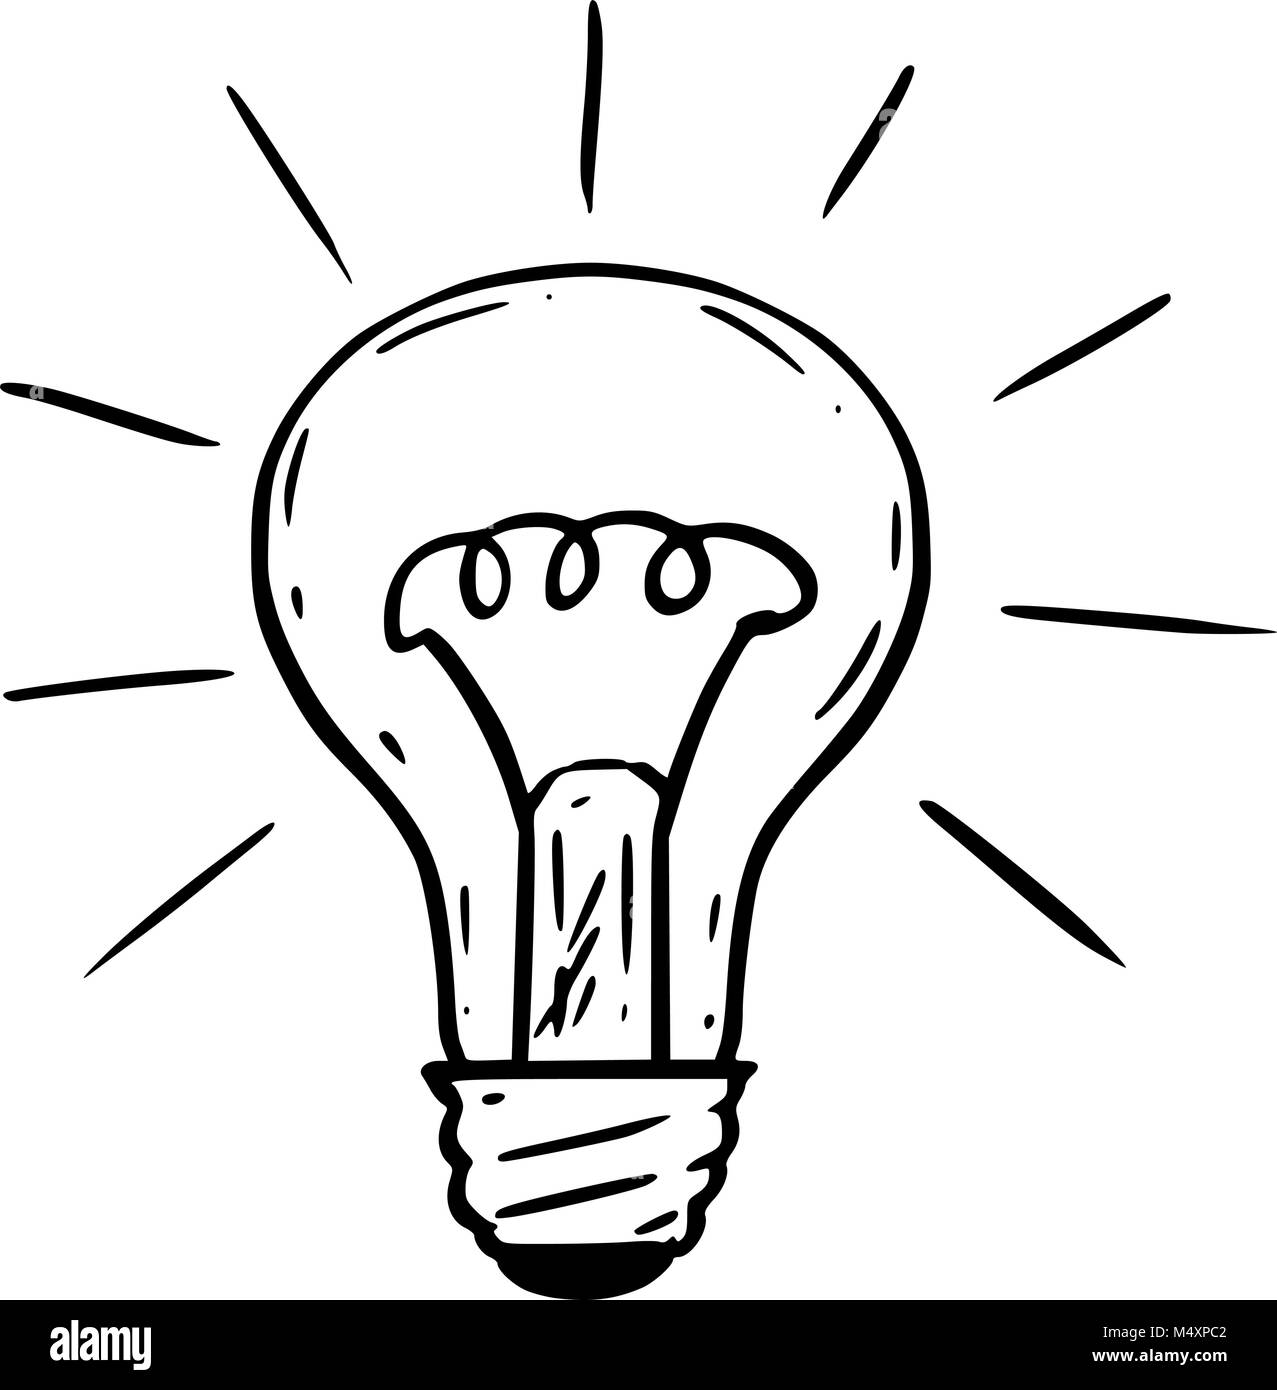 Cartoon Shining Light Bulb Black And White Stock Photos Images Alamy